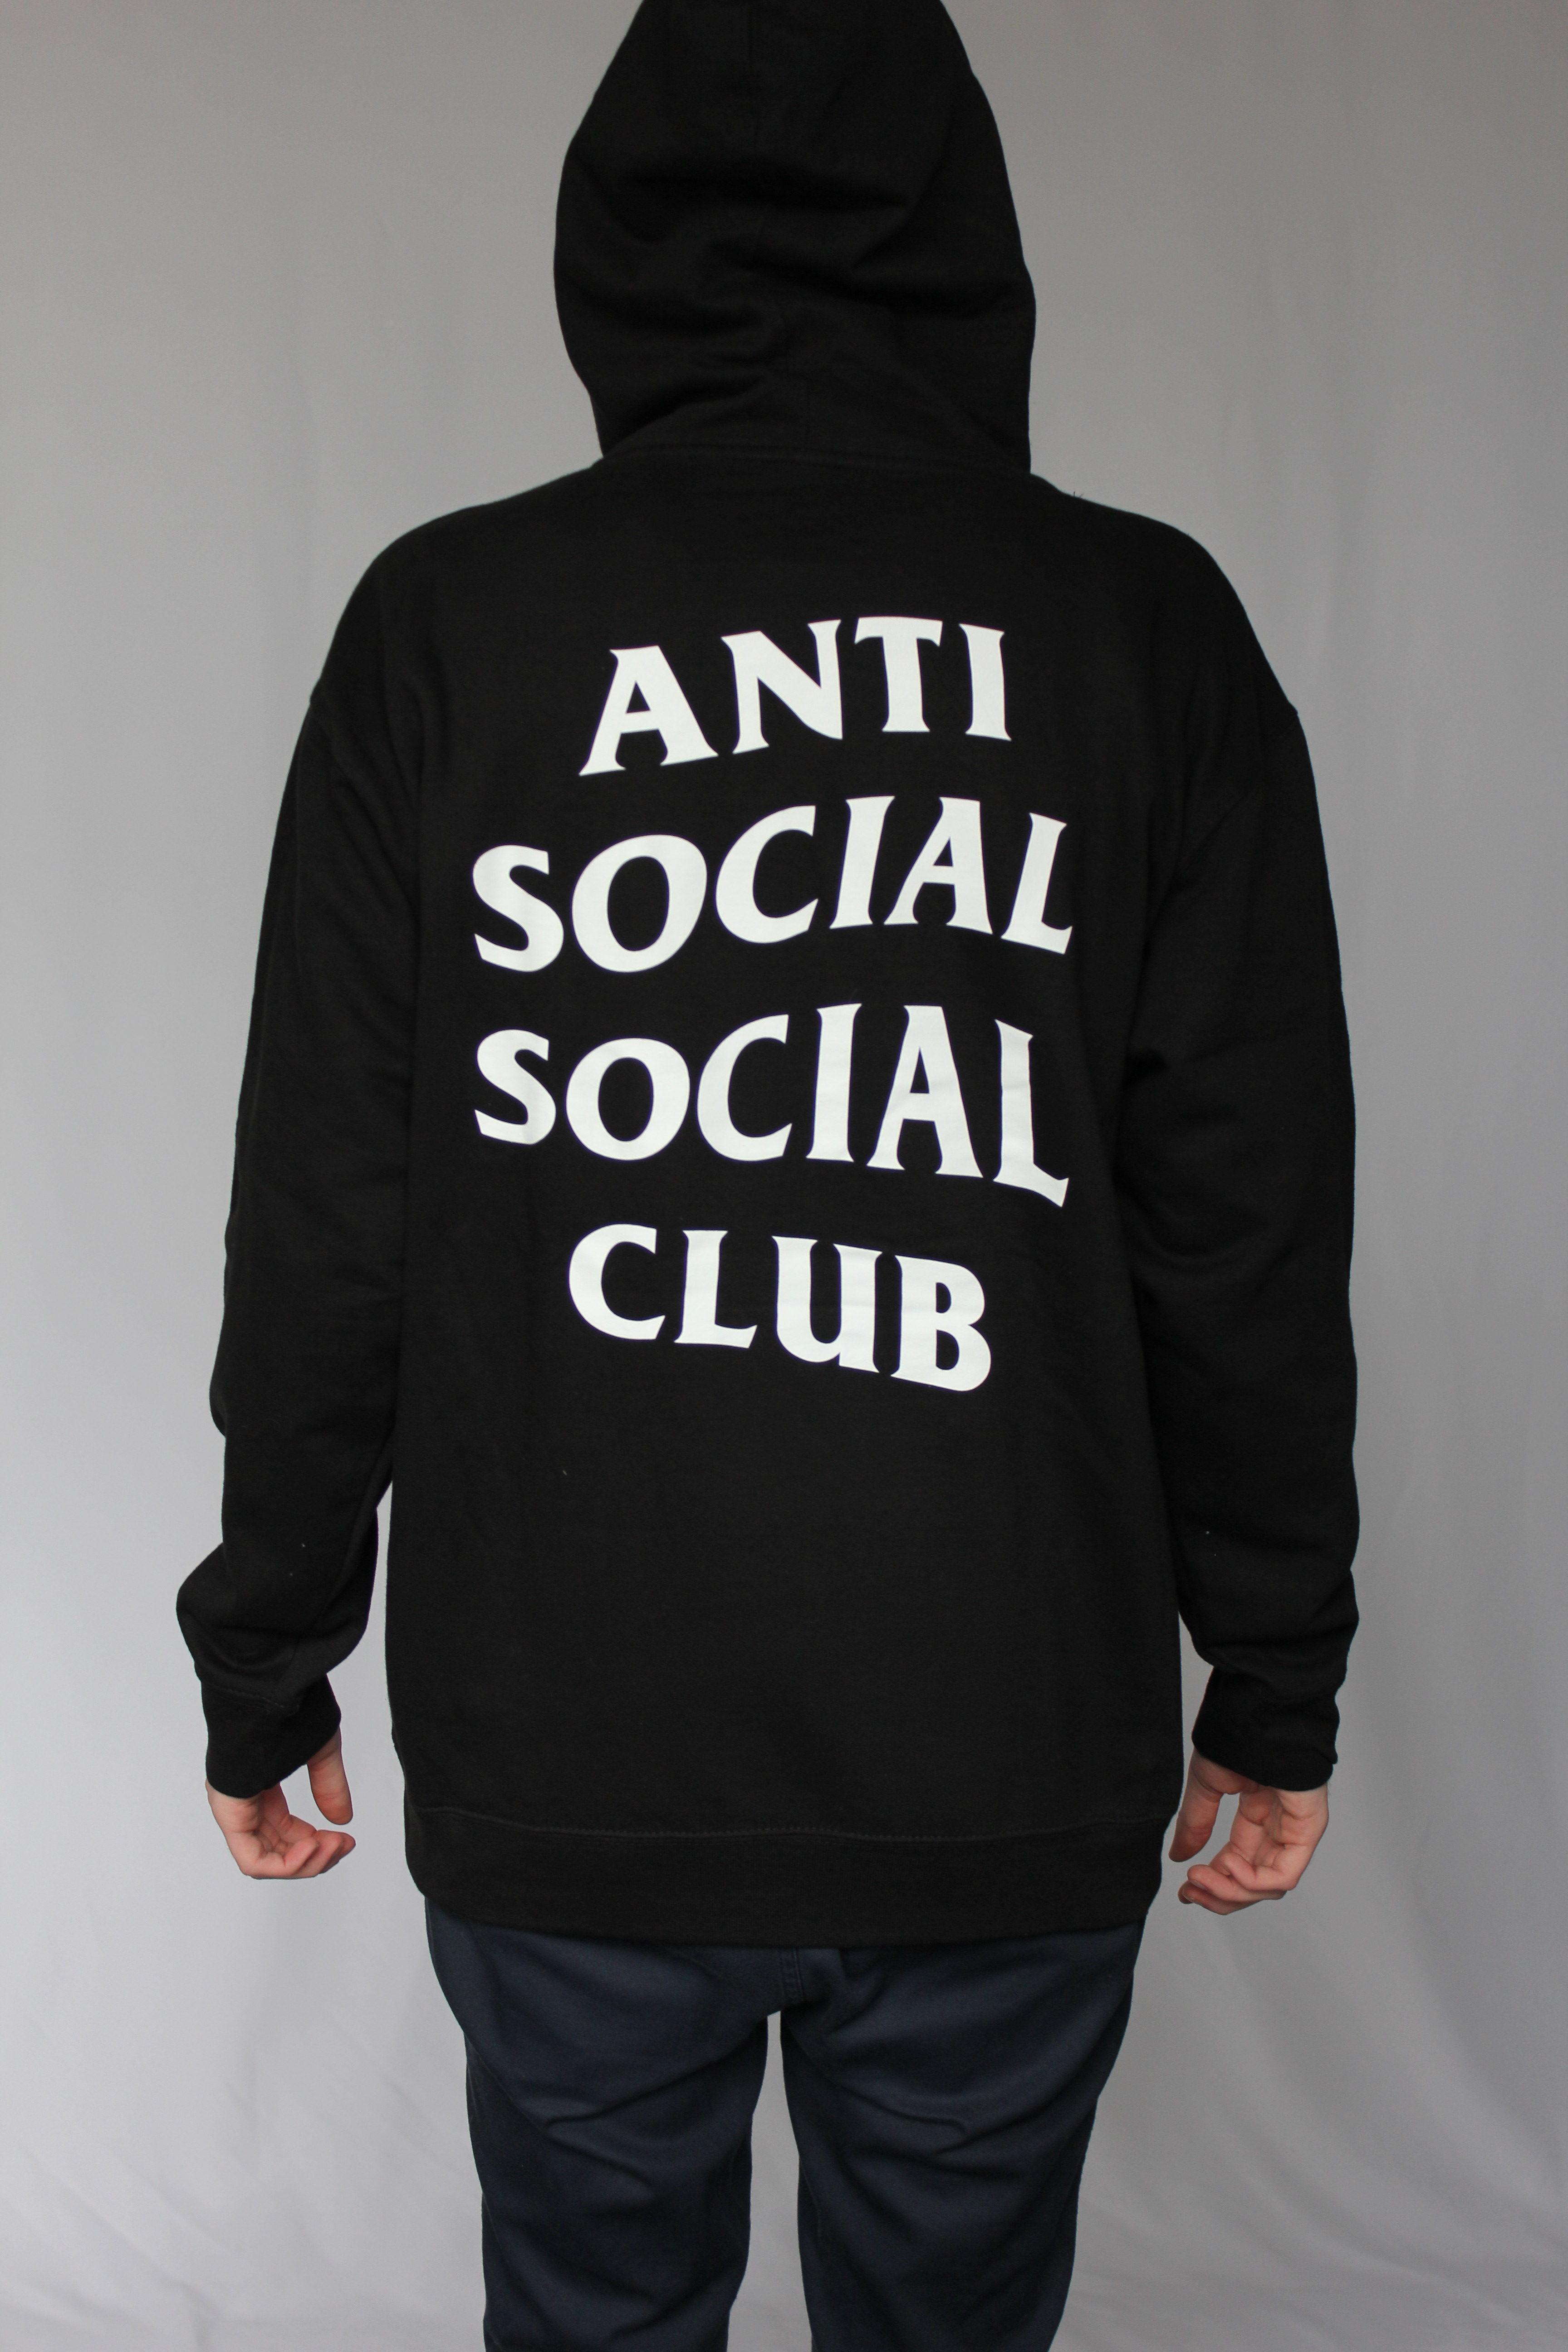 7bd6a22abc41 Anti Social Social Club – Mind Games Hoodie – Fragmented Citizen